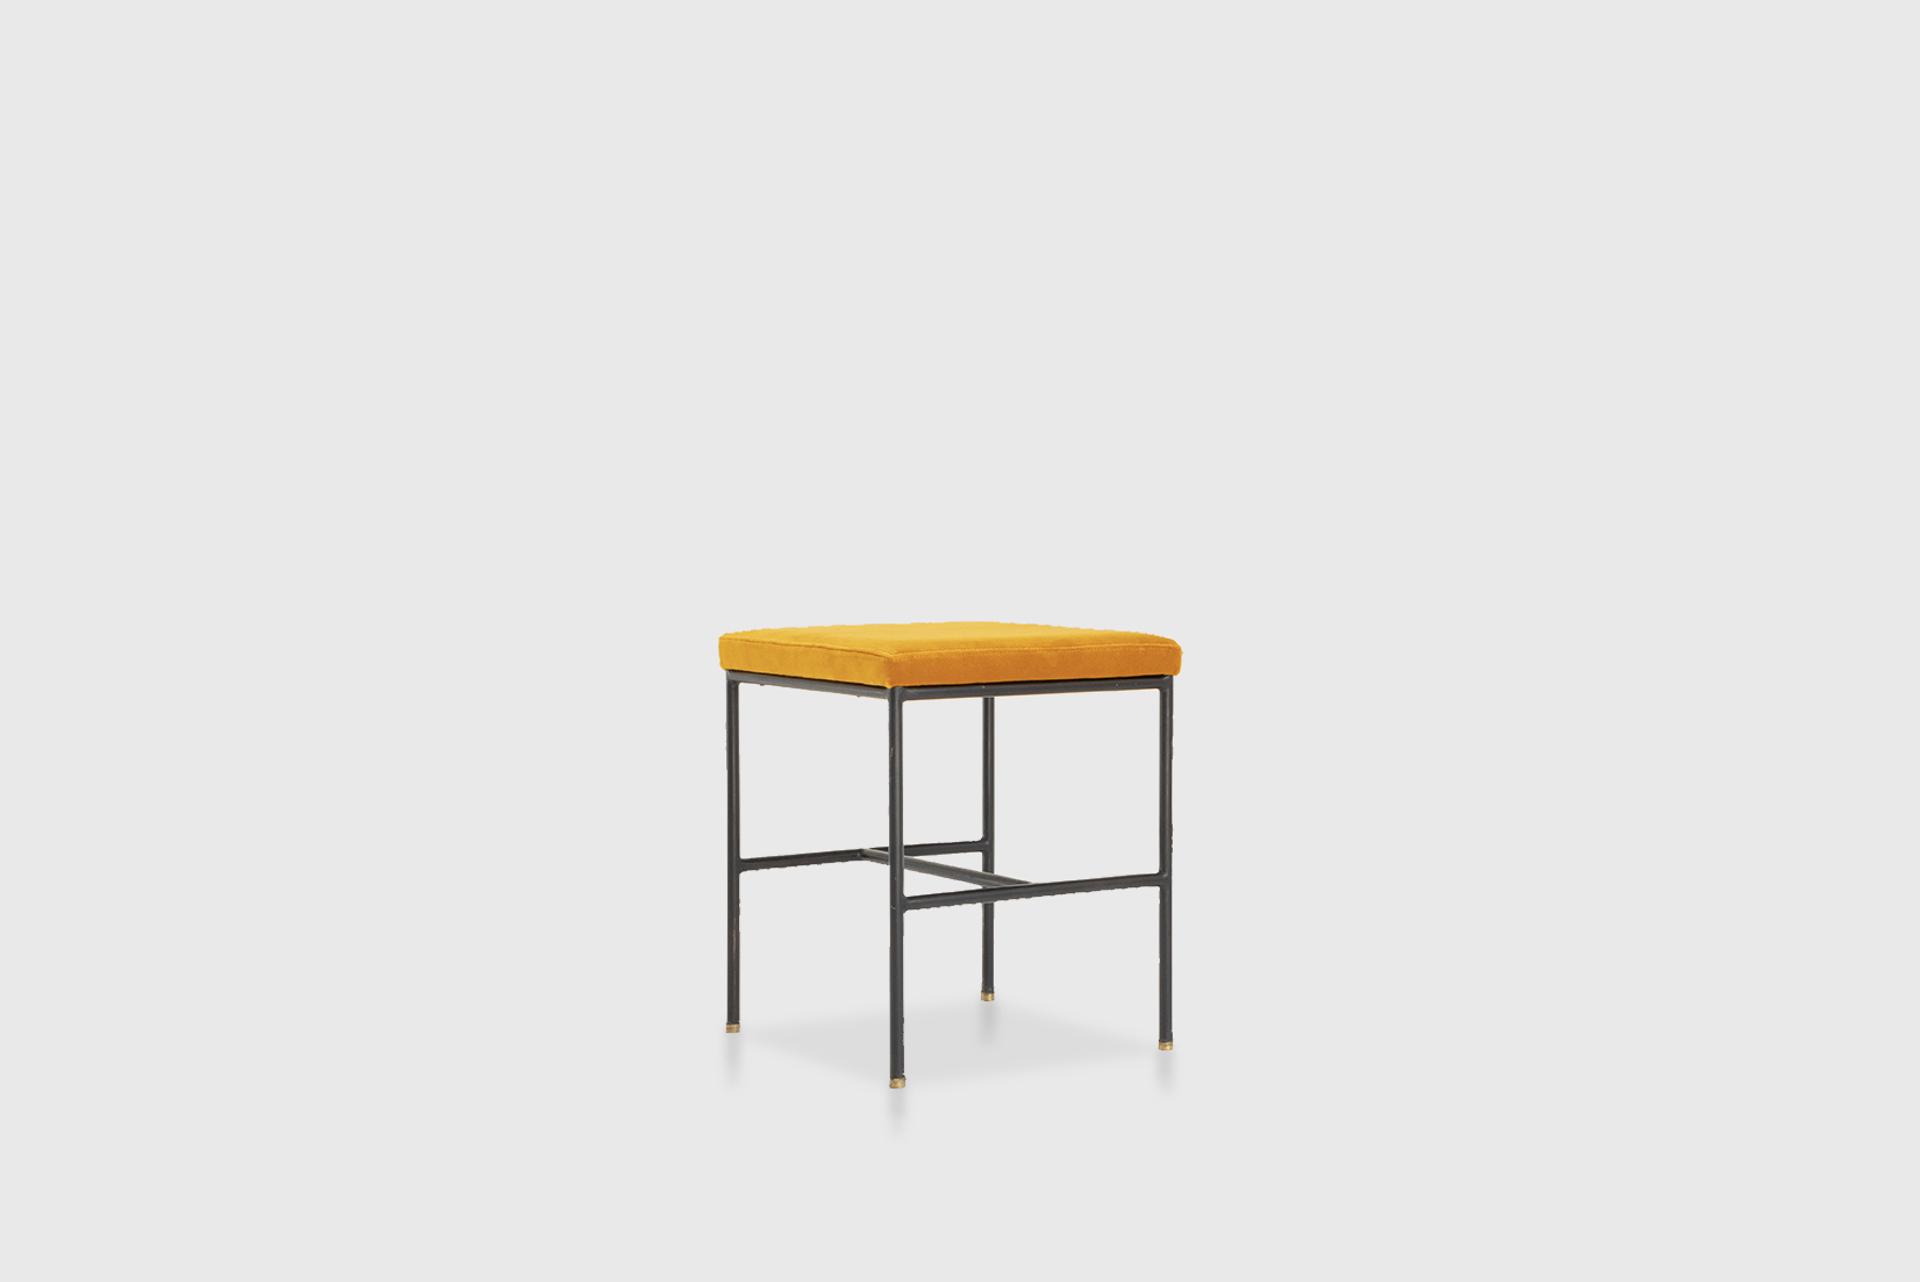 Vanity Desk Manufactured by Unilabor Brasil, 1955 Iron, jacaranda, mirror